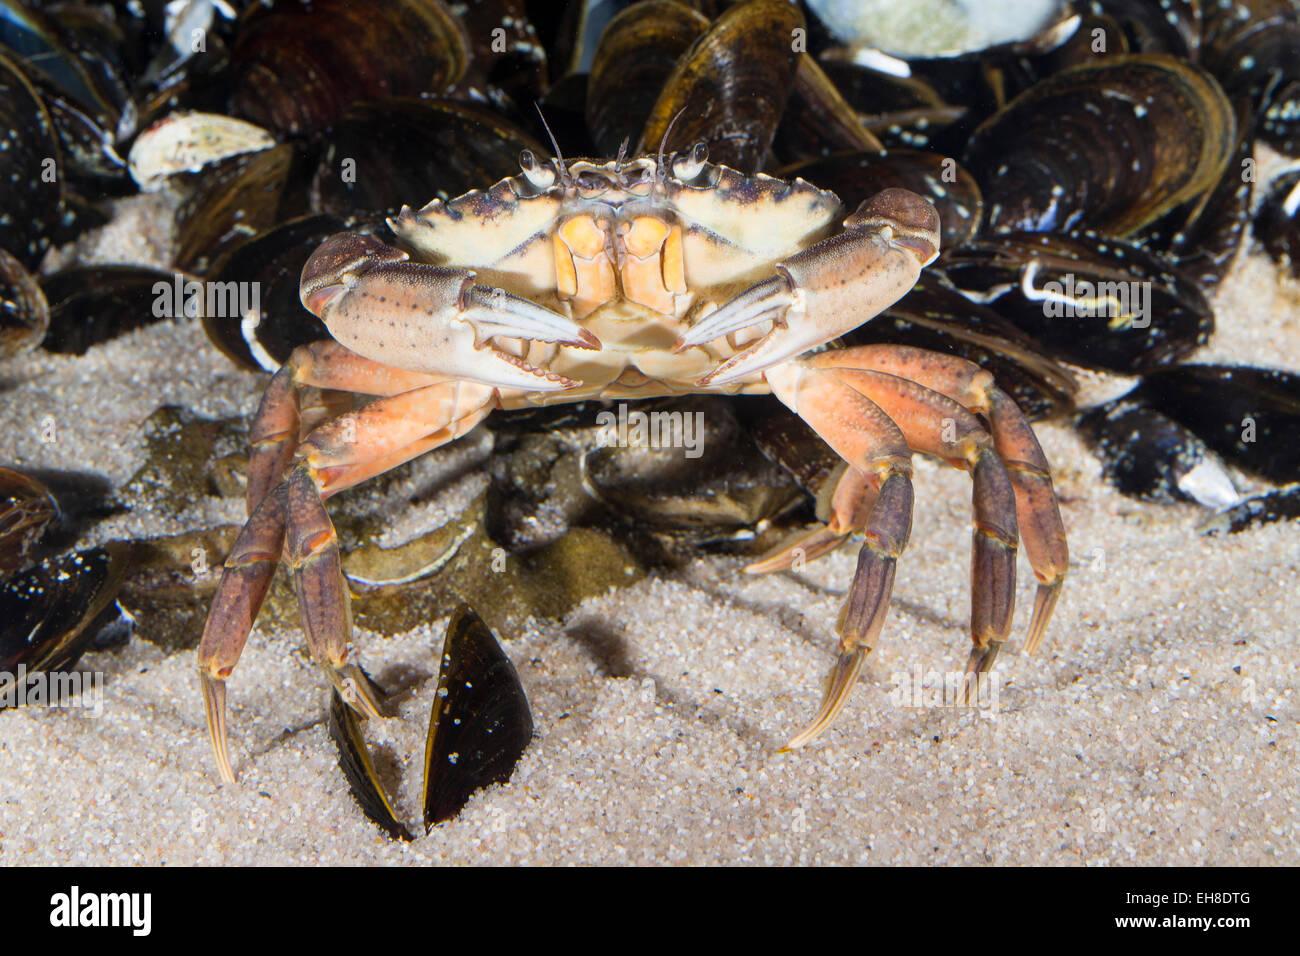 European shore crab, shore-crab, harbour crab, European green crab, Strandkrabbe, Strand-Krabbe, Carcinus maenas, - Stock Image